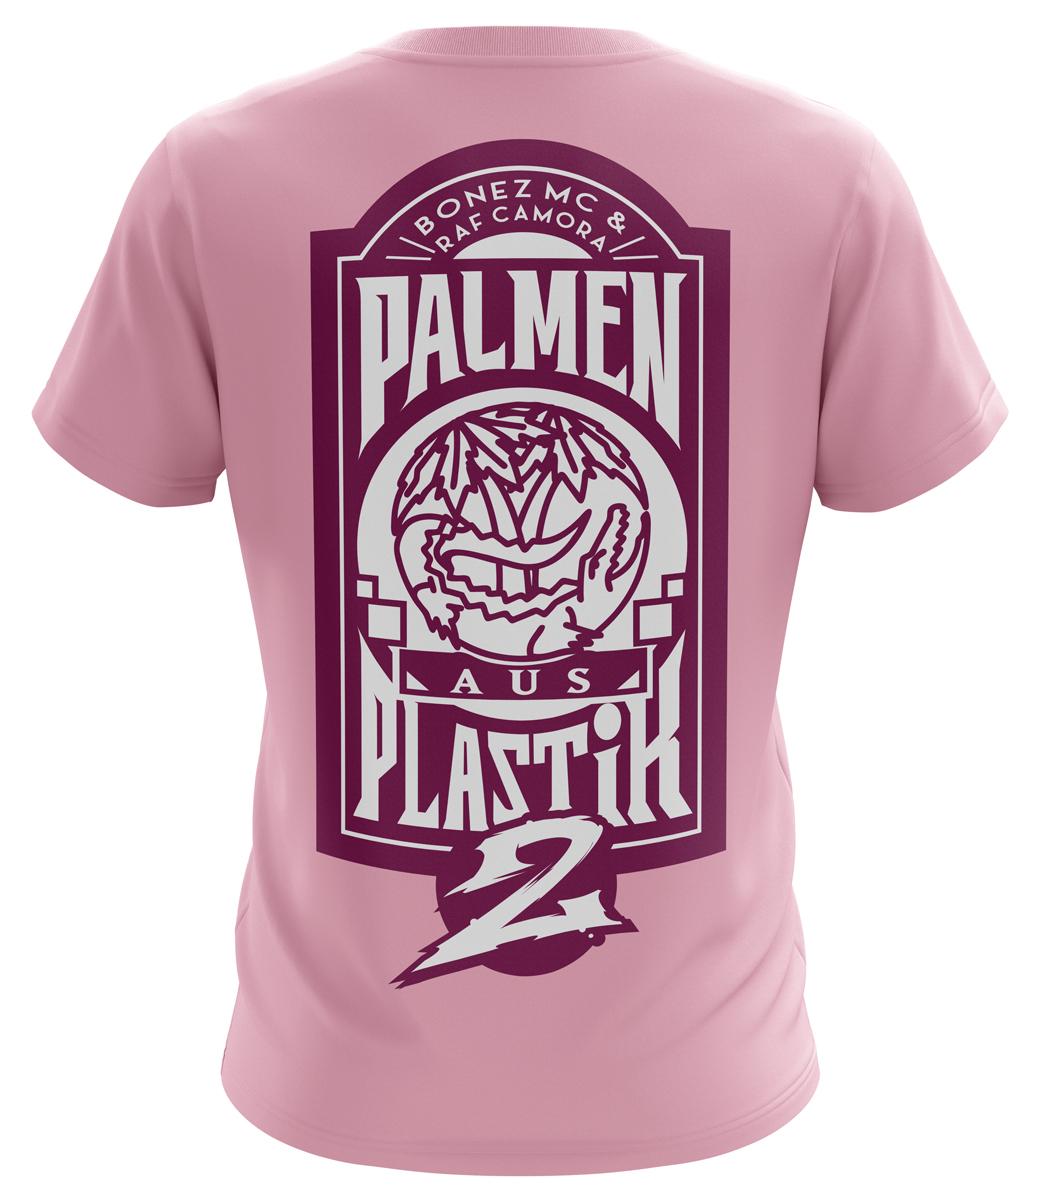 Palmen Aus Plastik 2 Pink Shirt 30 Shop